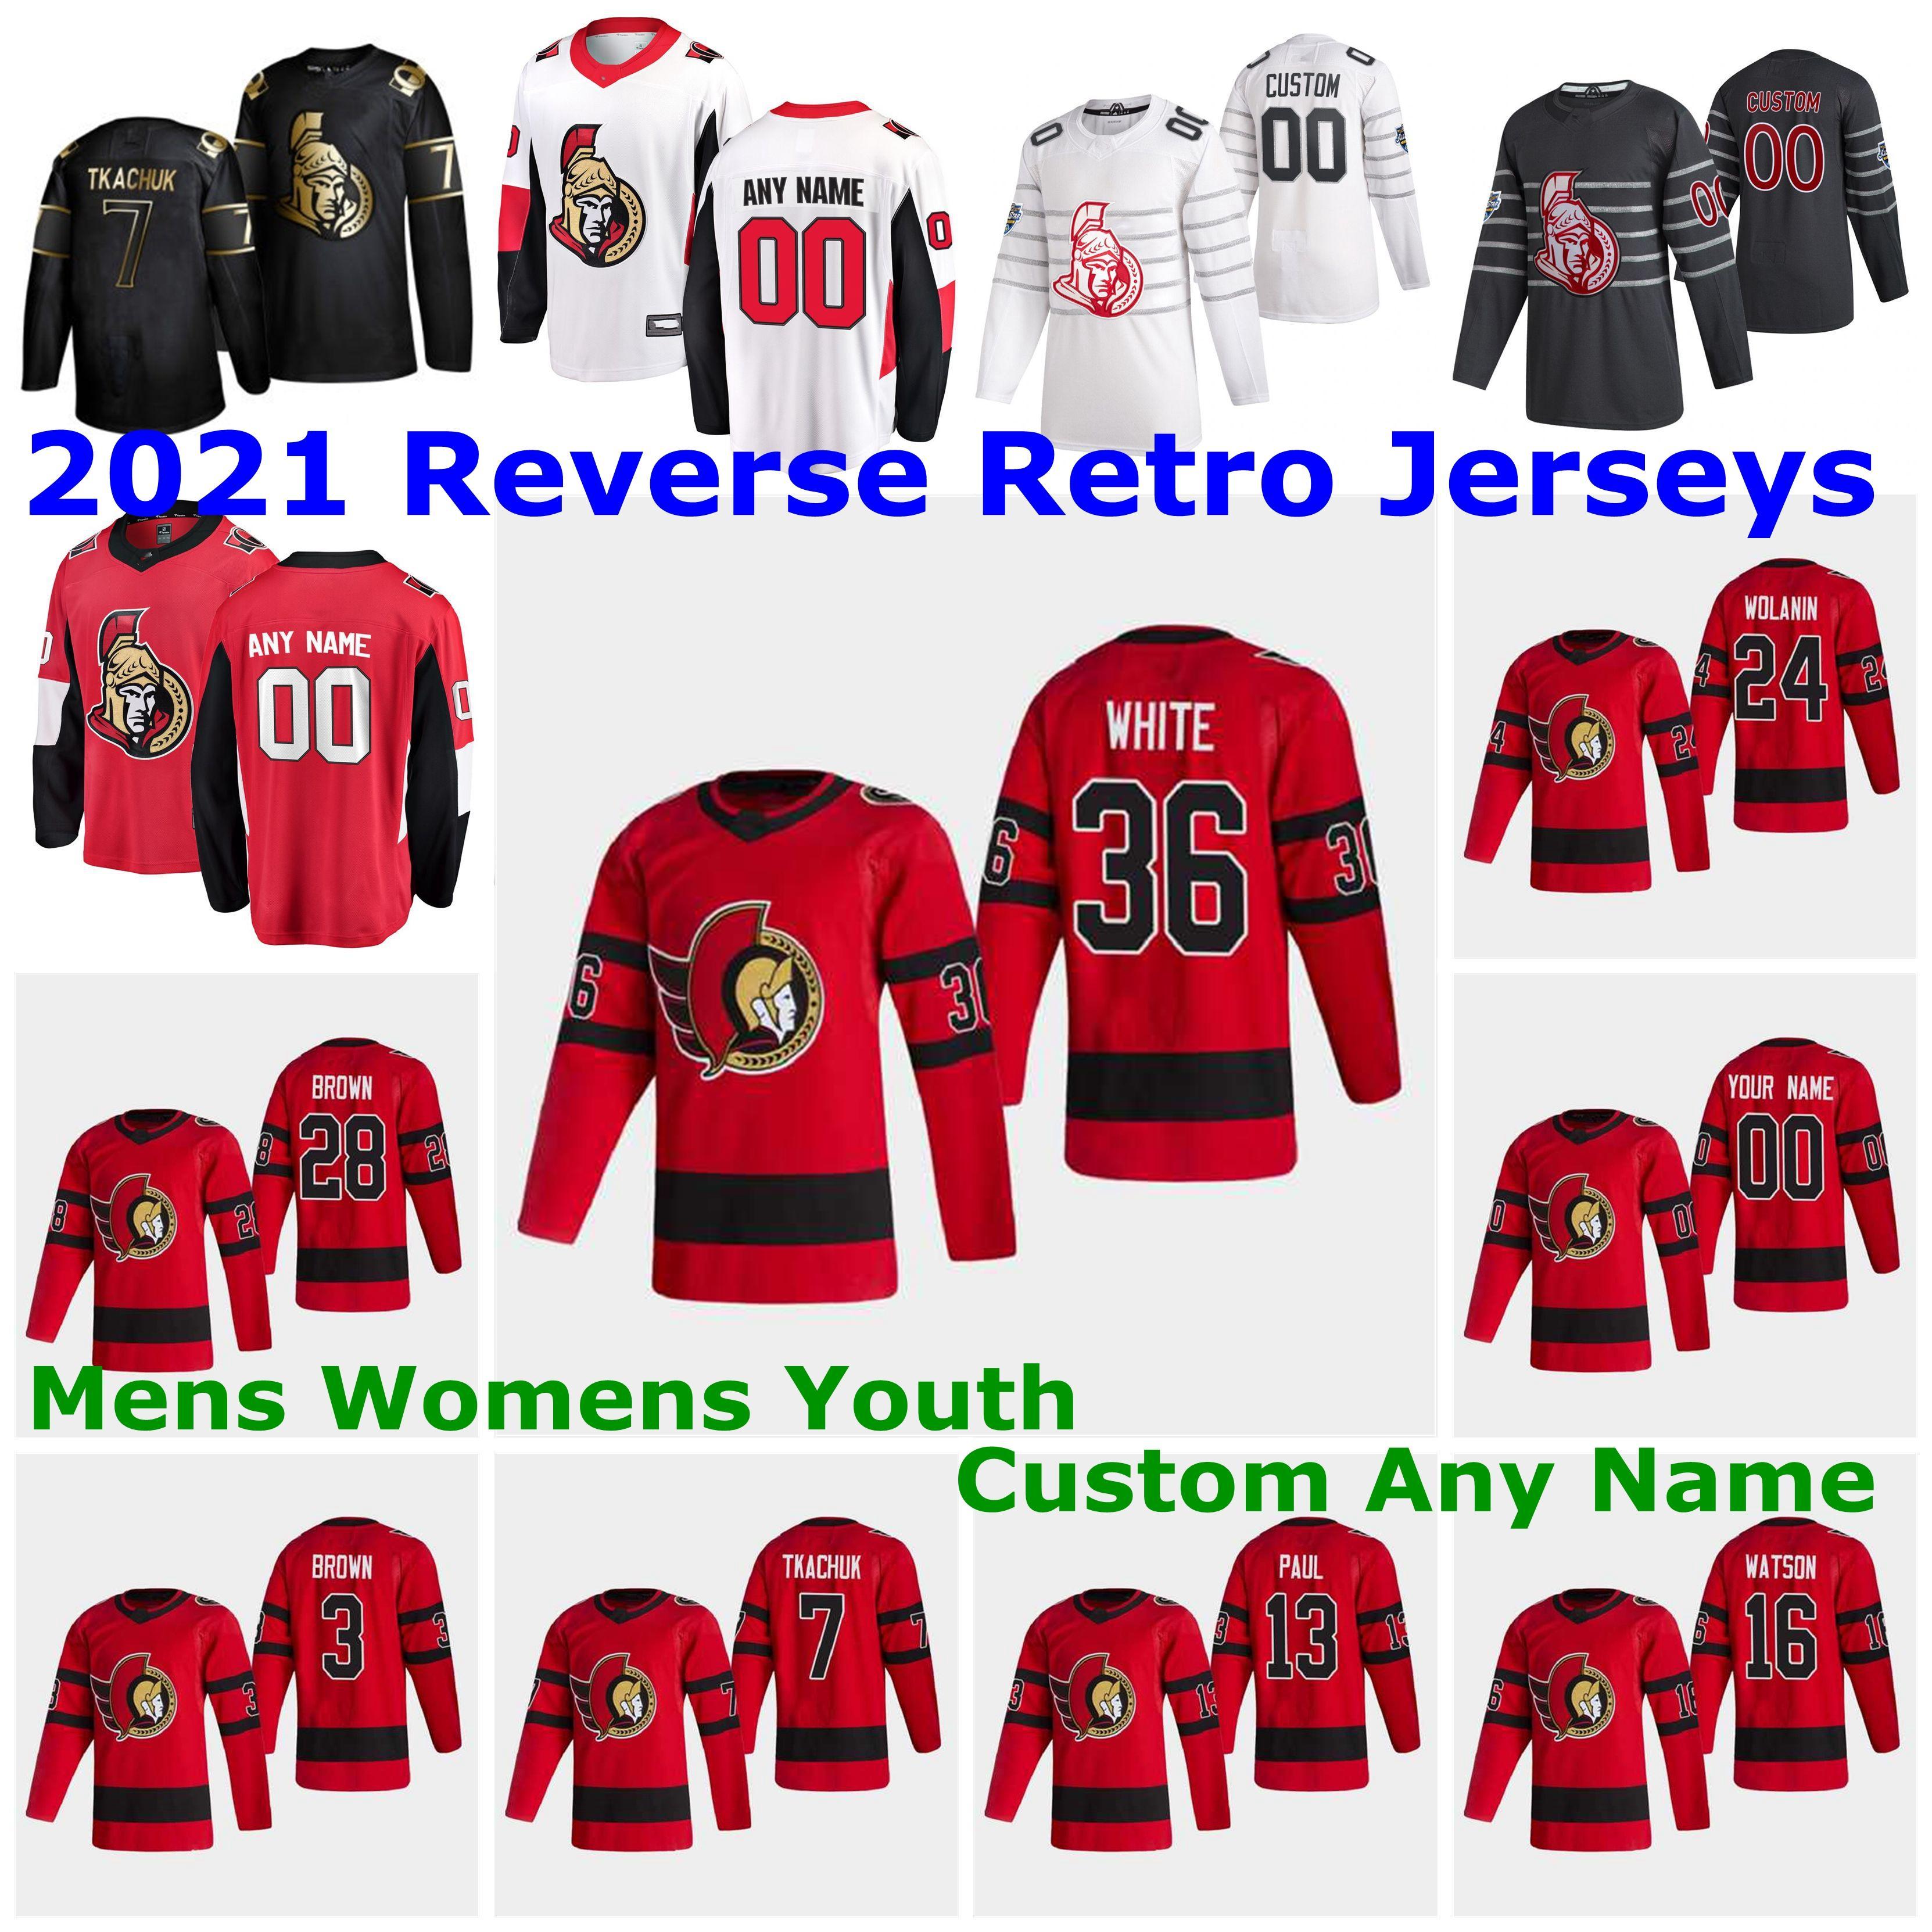 Ottawa Senators 2021 Reverse Retro Jerseys 95 Matt Duchene Jersey Mark Stone Artem Anisimov Rudolfs Balcers Mikkel Boedker Custom Stitched